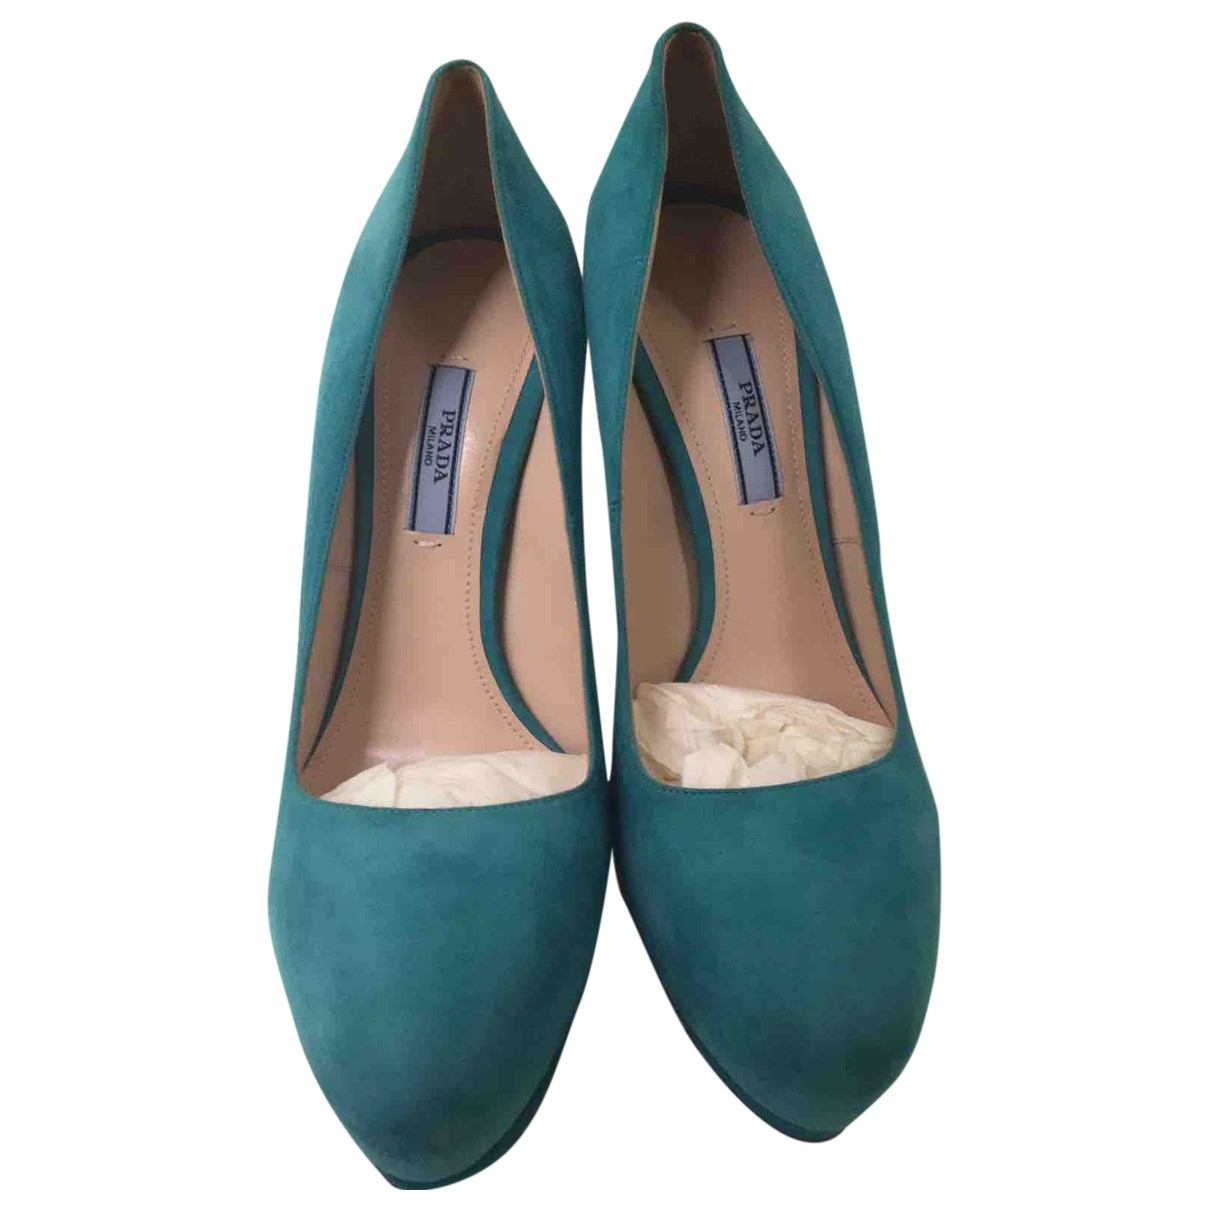 Prada \N Turquoise Suede Heels for Women 39 EU